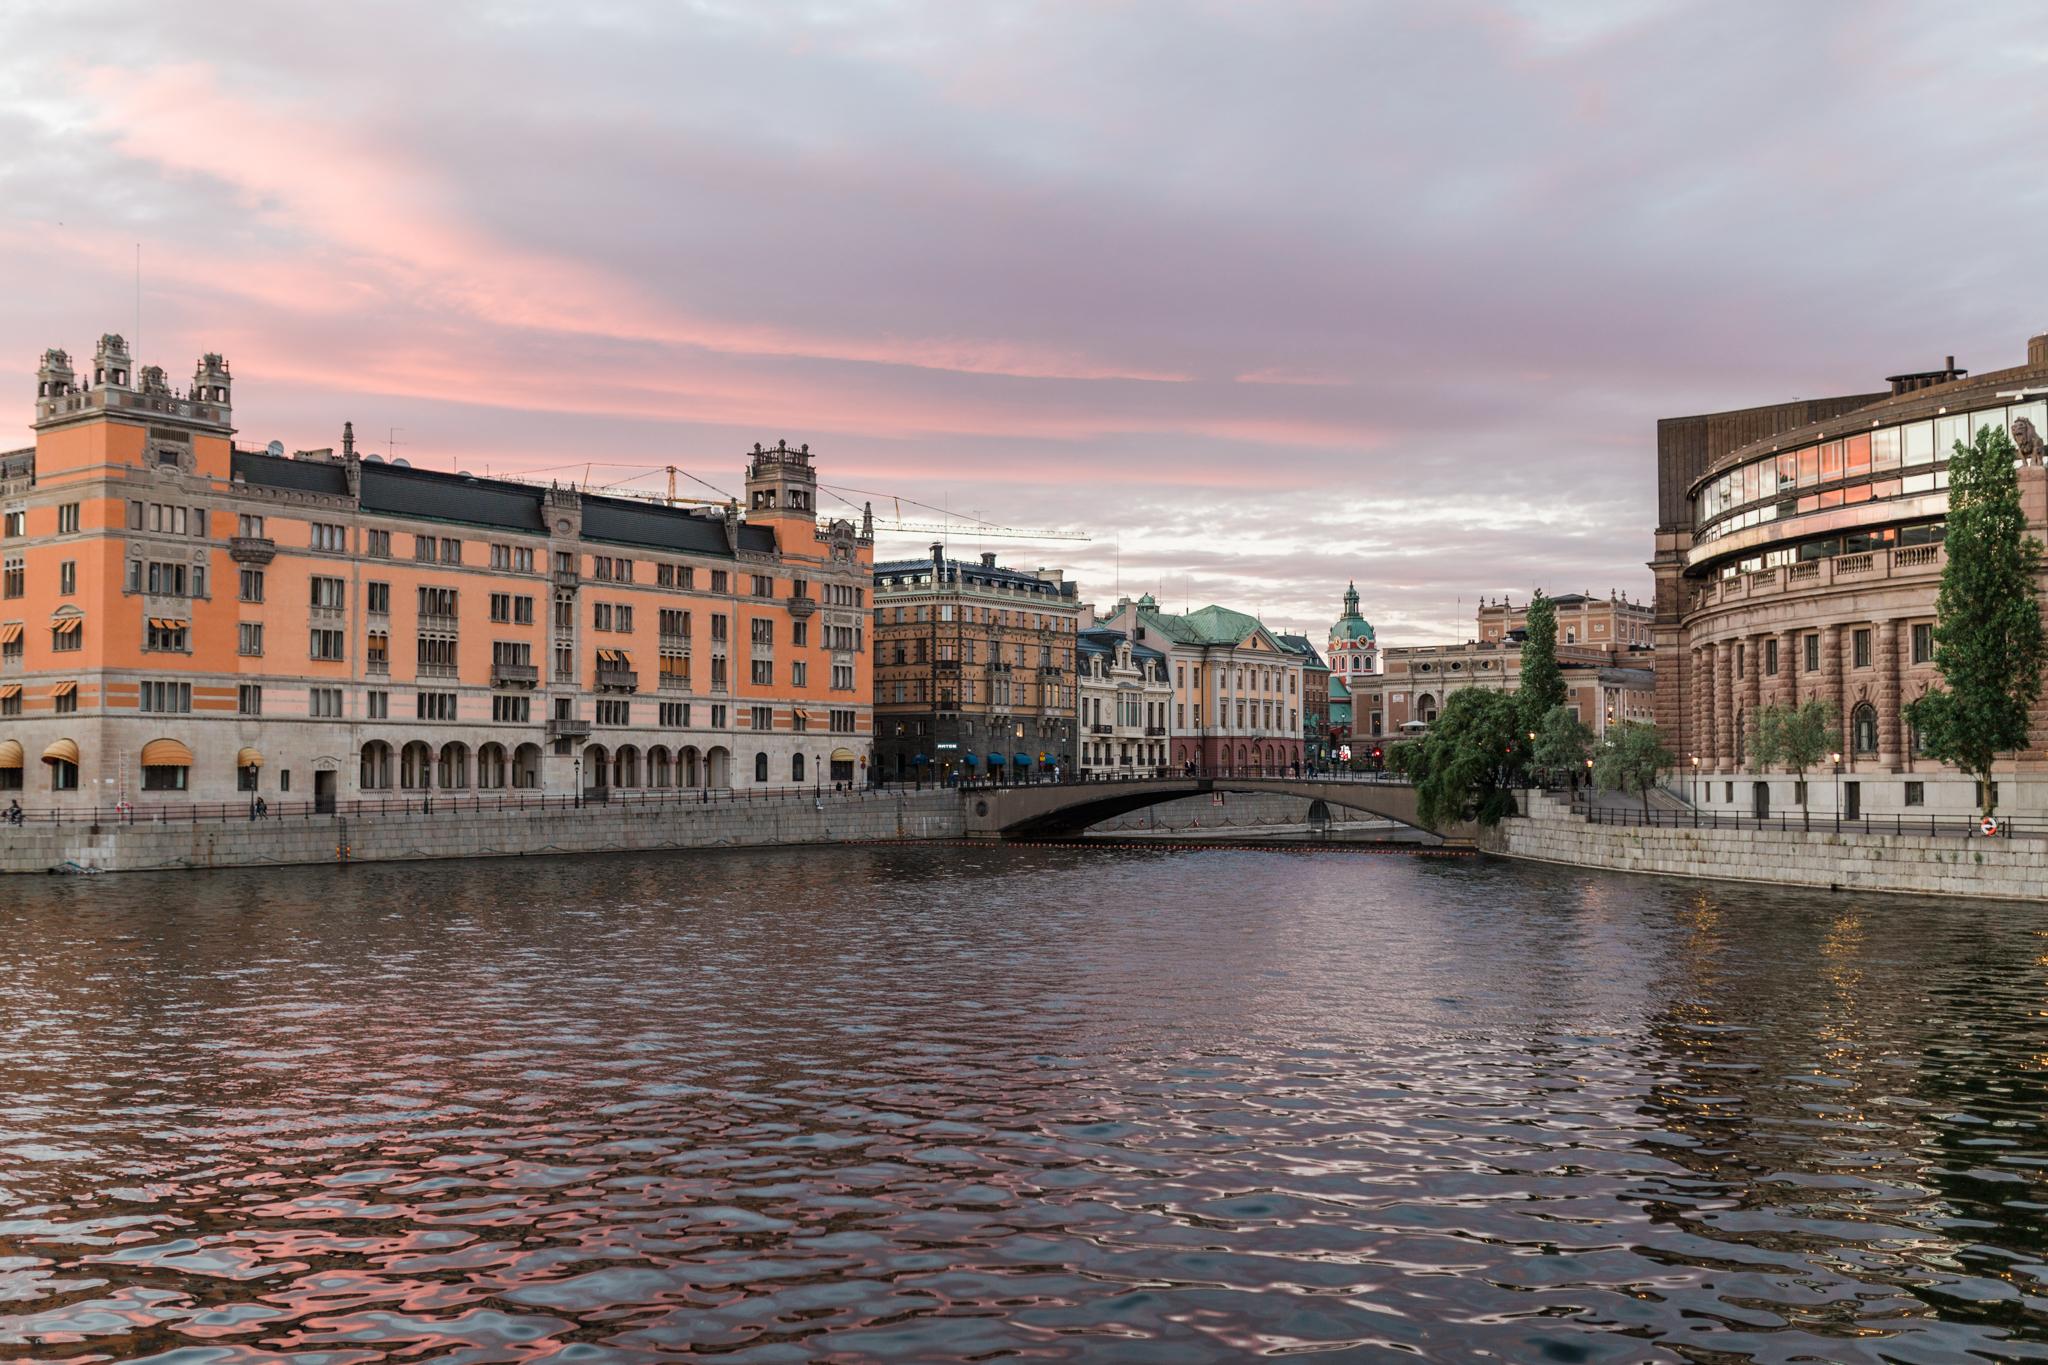 stockholm-018.jpg